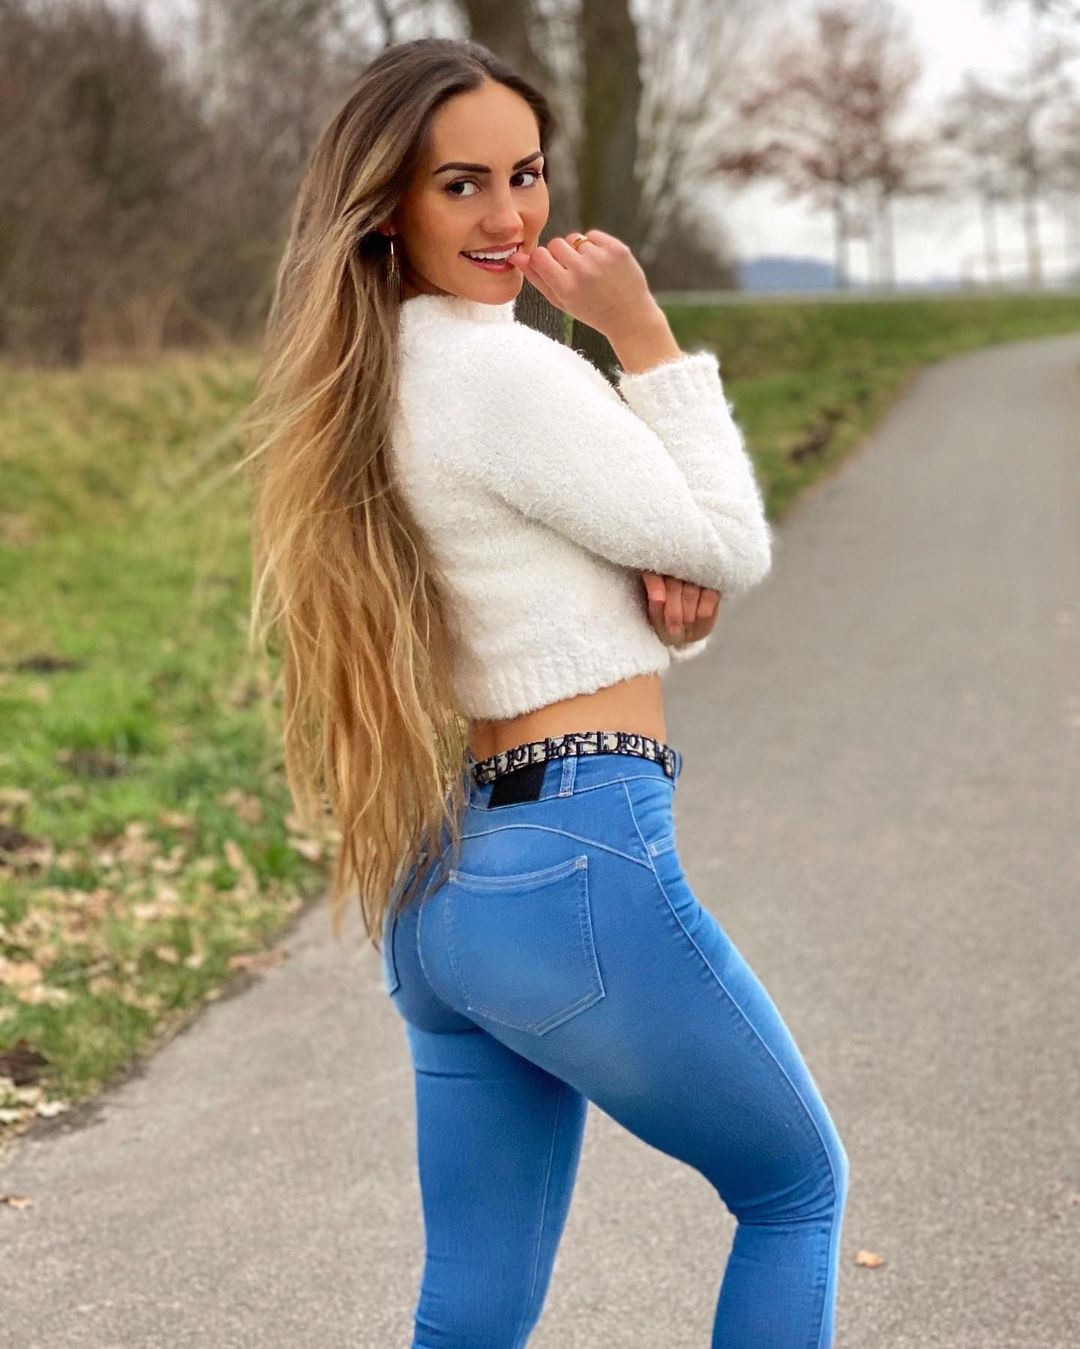 Natalie-Ice-Wallpapers-Insta-Fit-Bio-16